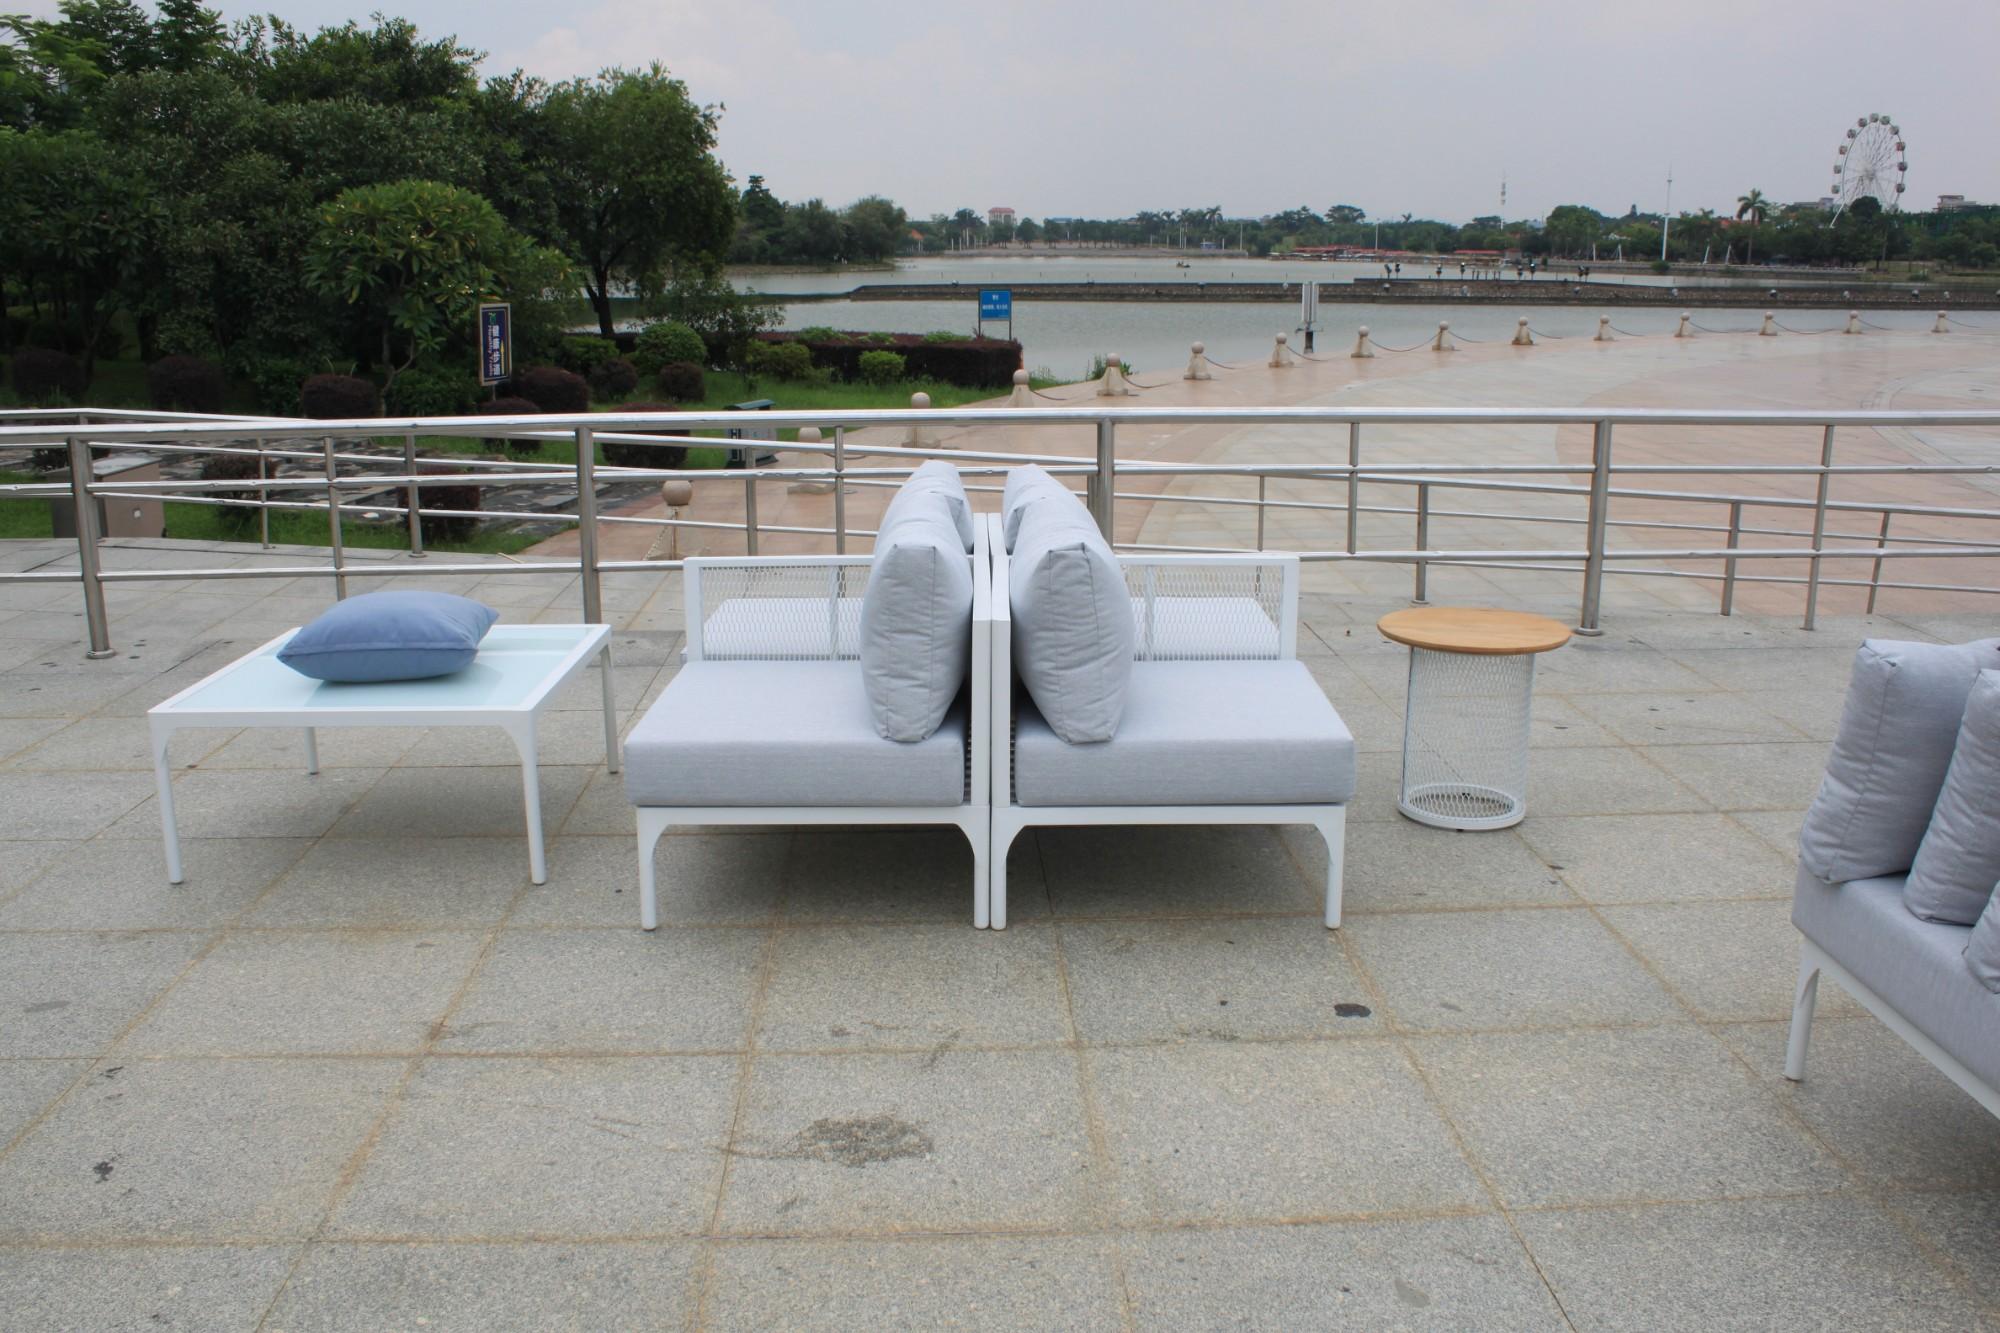 aluminium garden sofa outdoor furniture Manufacturers, aluminium garden sofa outdoor furniture Factory, Supply aluminium garden sofa outdoor furniture